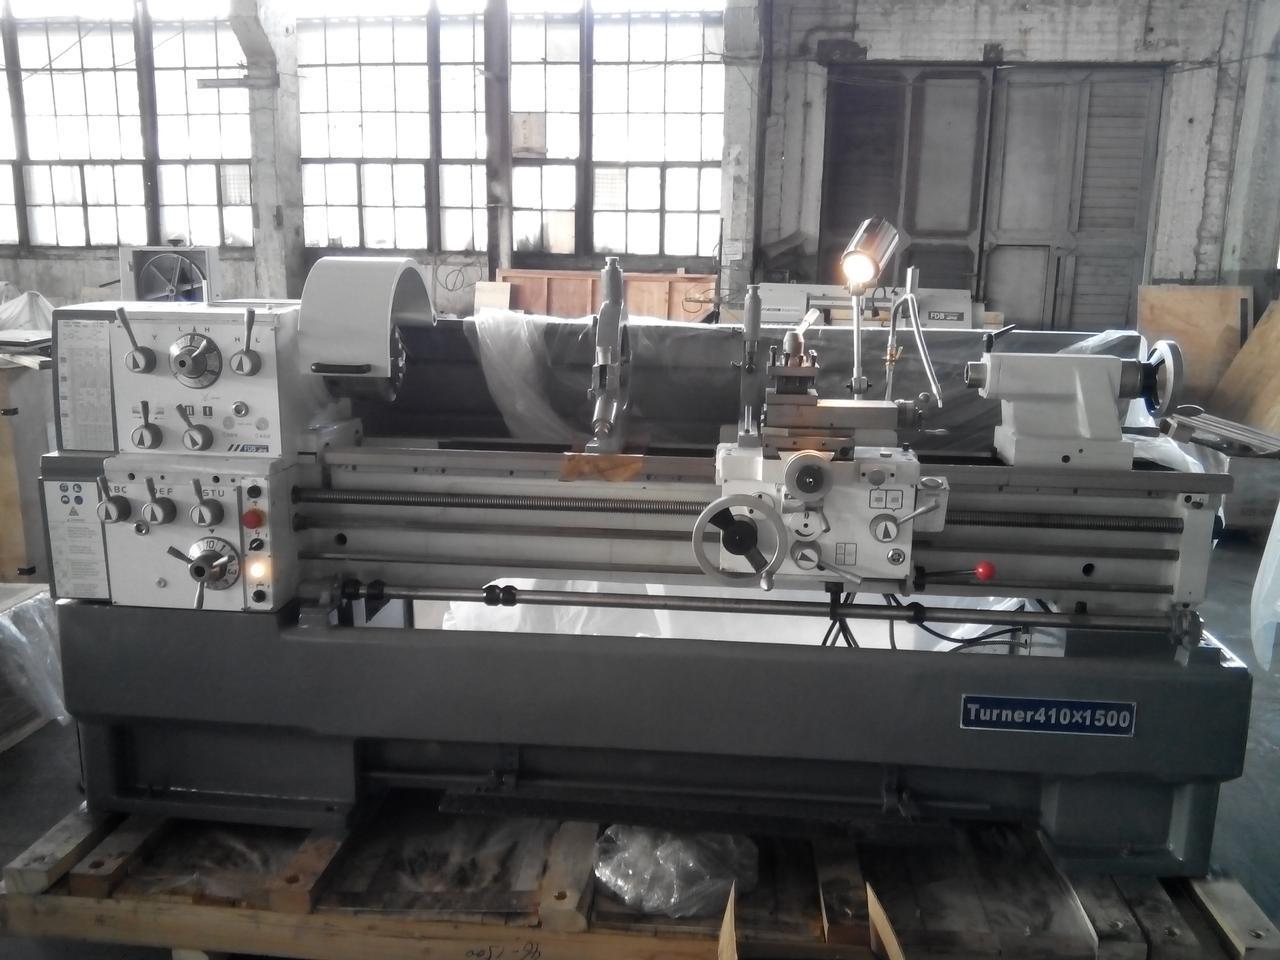 Токарный станок FDB Maschinen Turner 410x1500